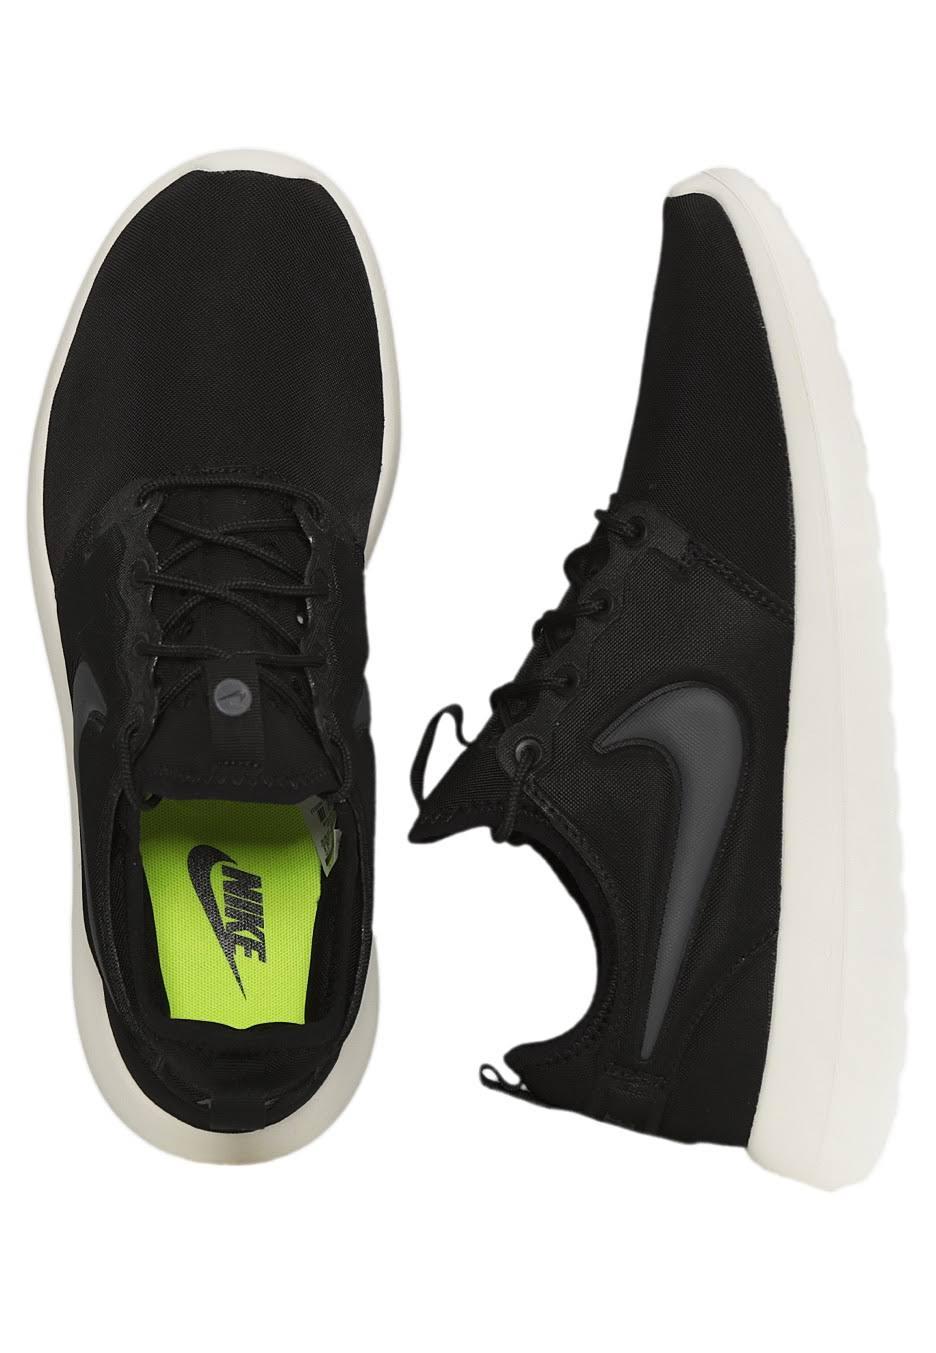 Anthrazit Two Segel Nike Roshe Mens 9 Style 844656 Schwarz TwRpqx